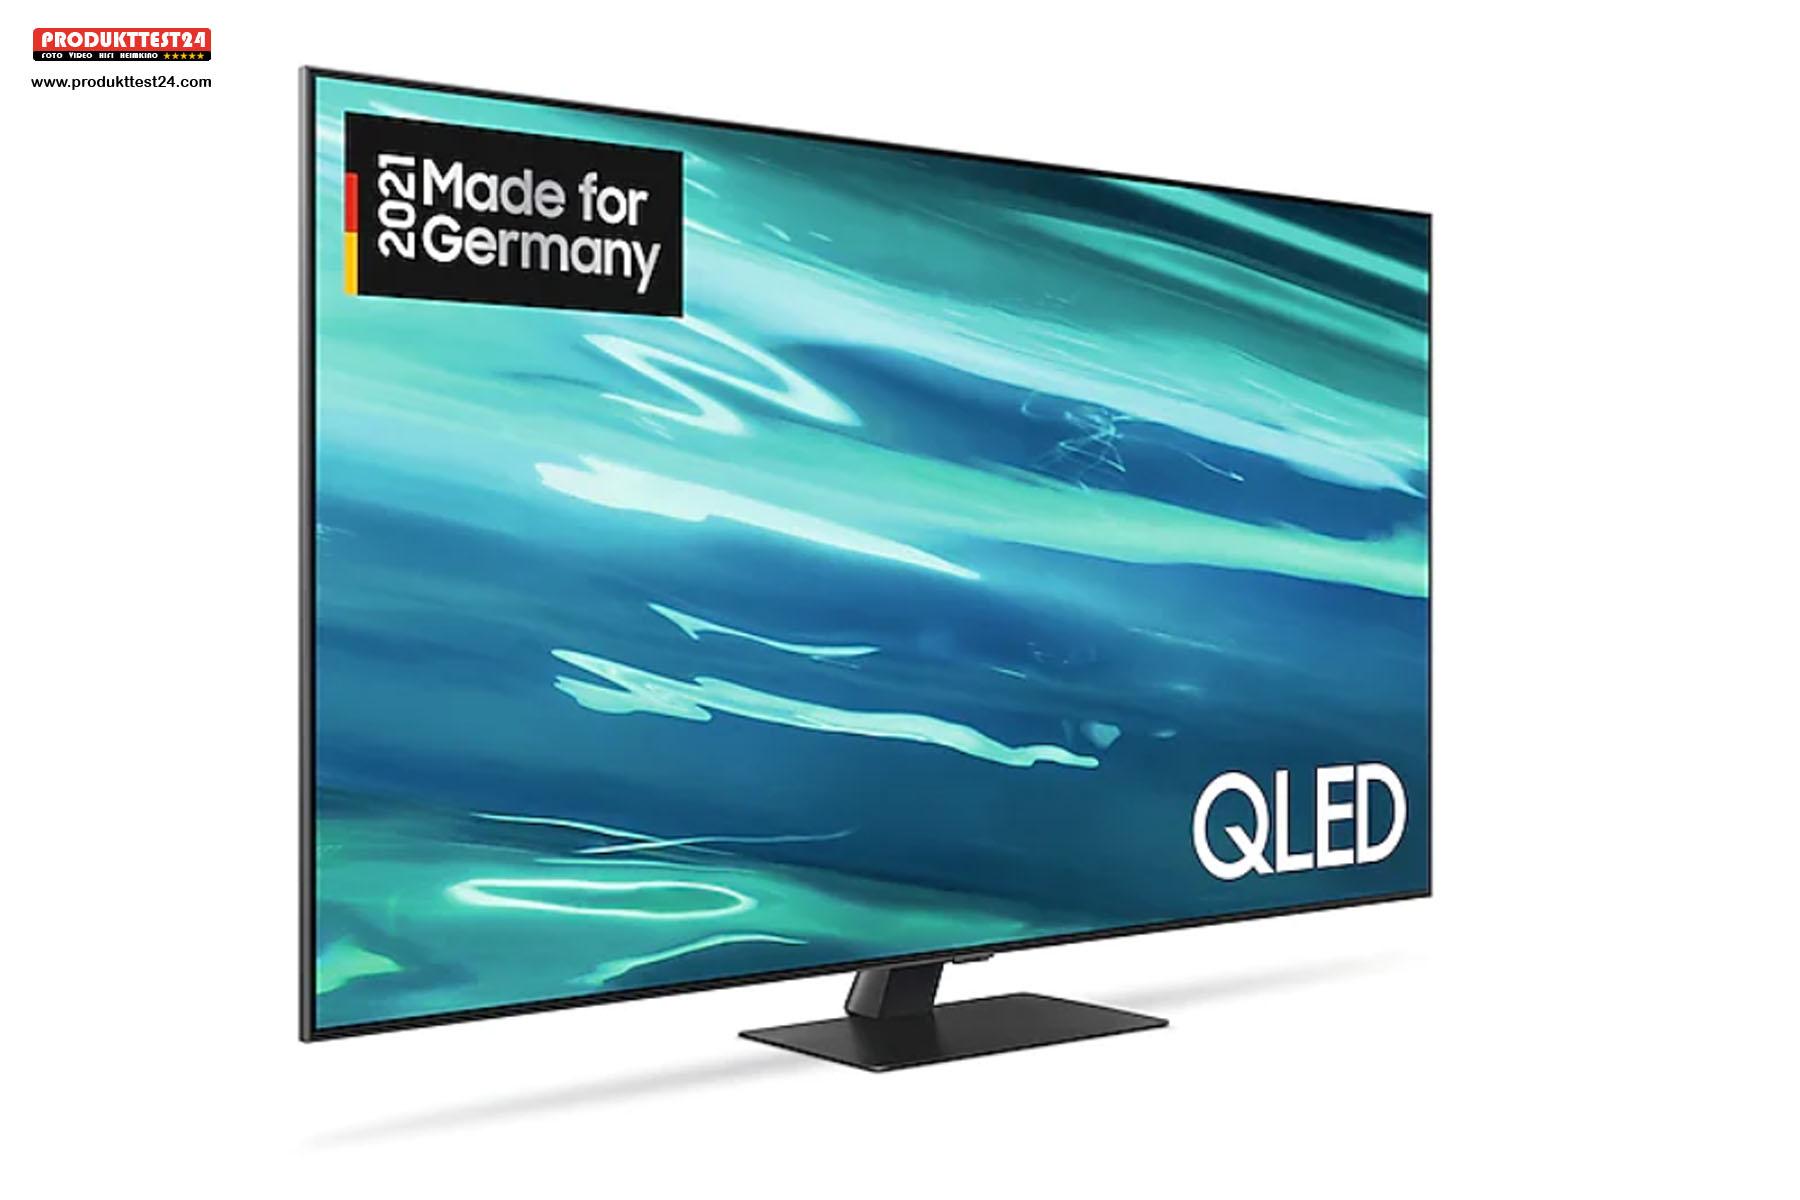 QLED 4K-Fernseher mit 65 Zoll Bilddiagonale